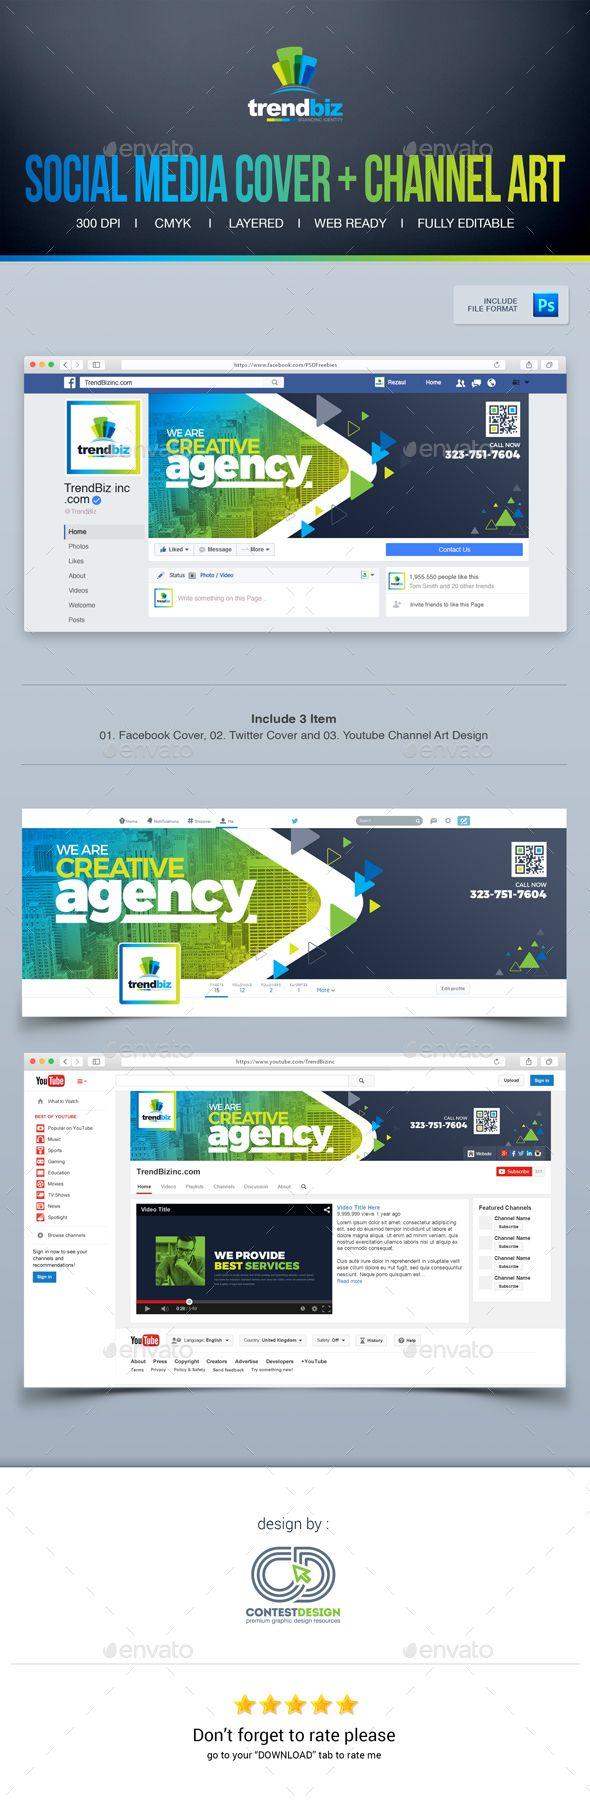 59 best Social Media images on Pinterest | Facebook banner, Blankets ...